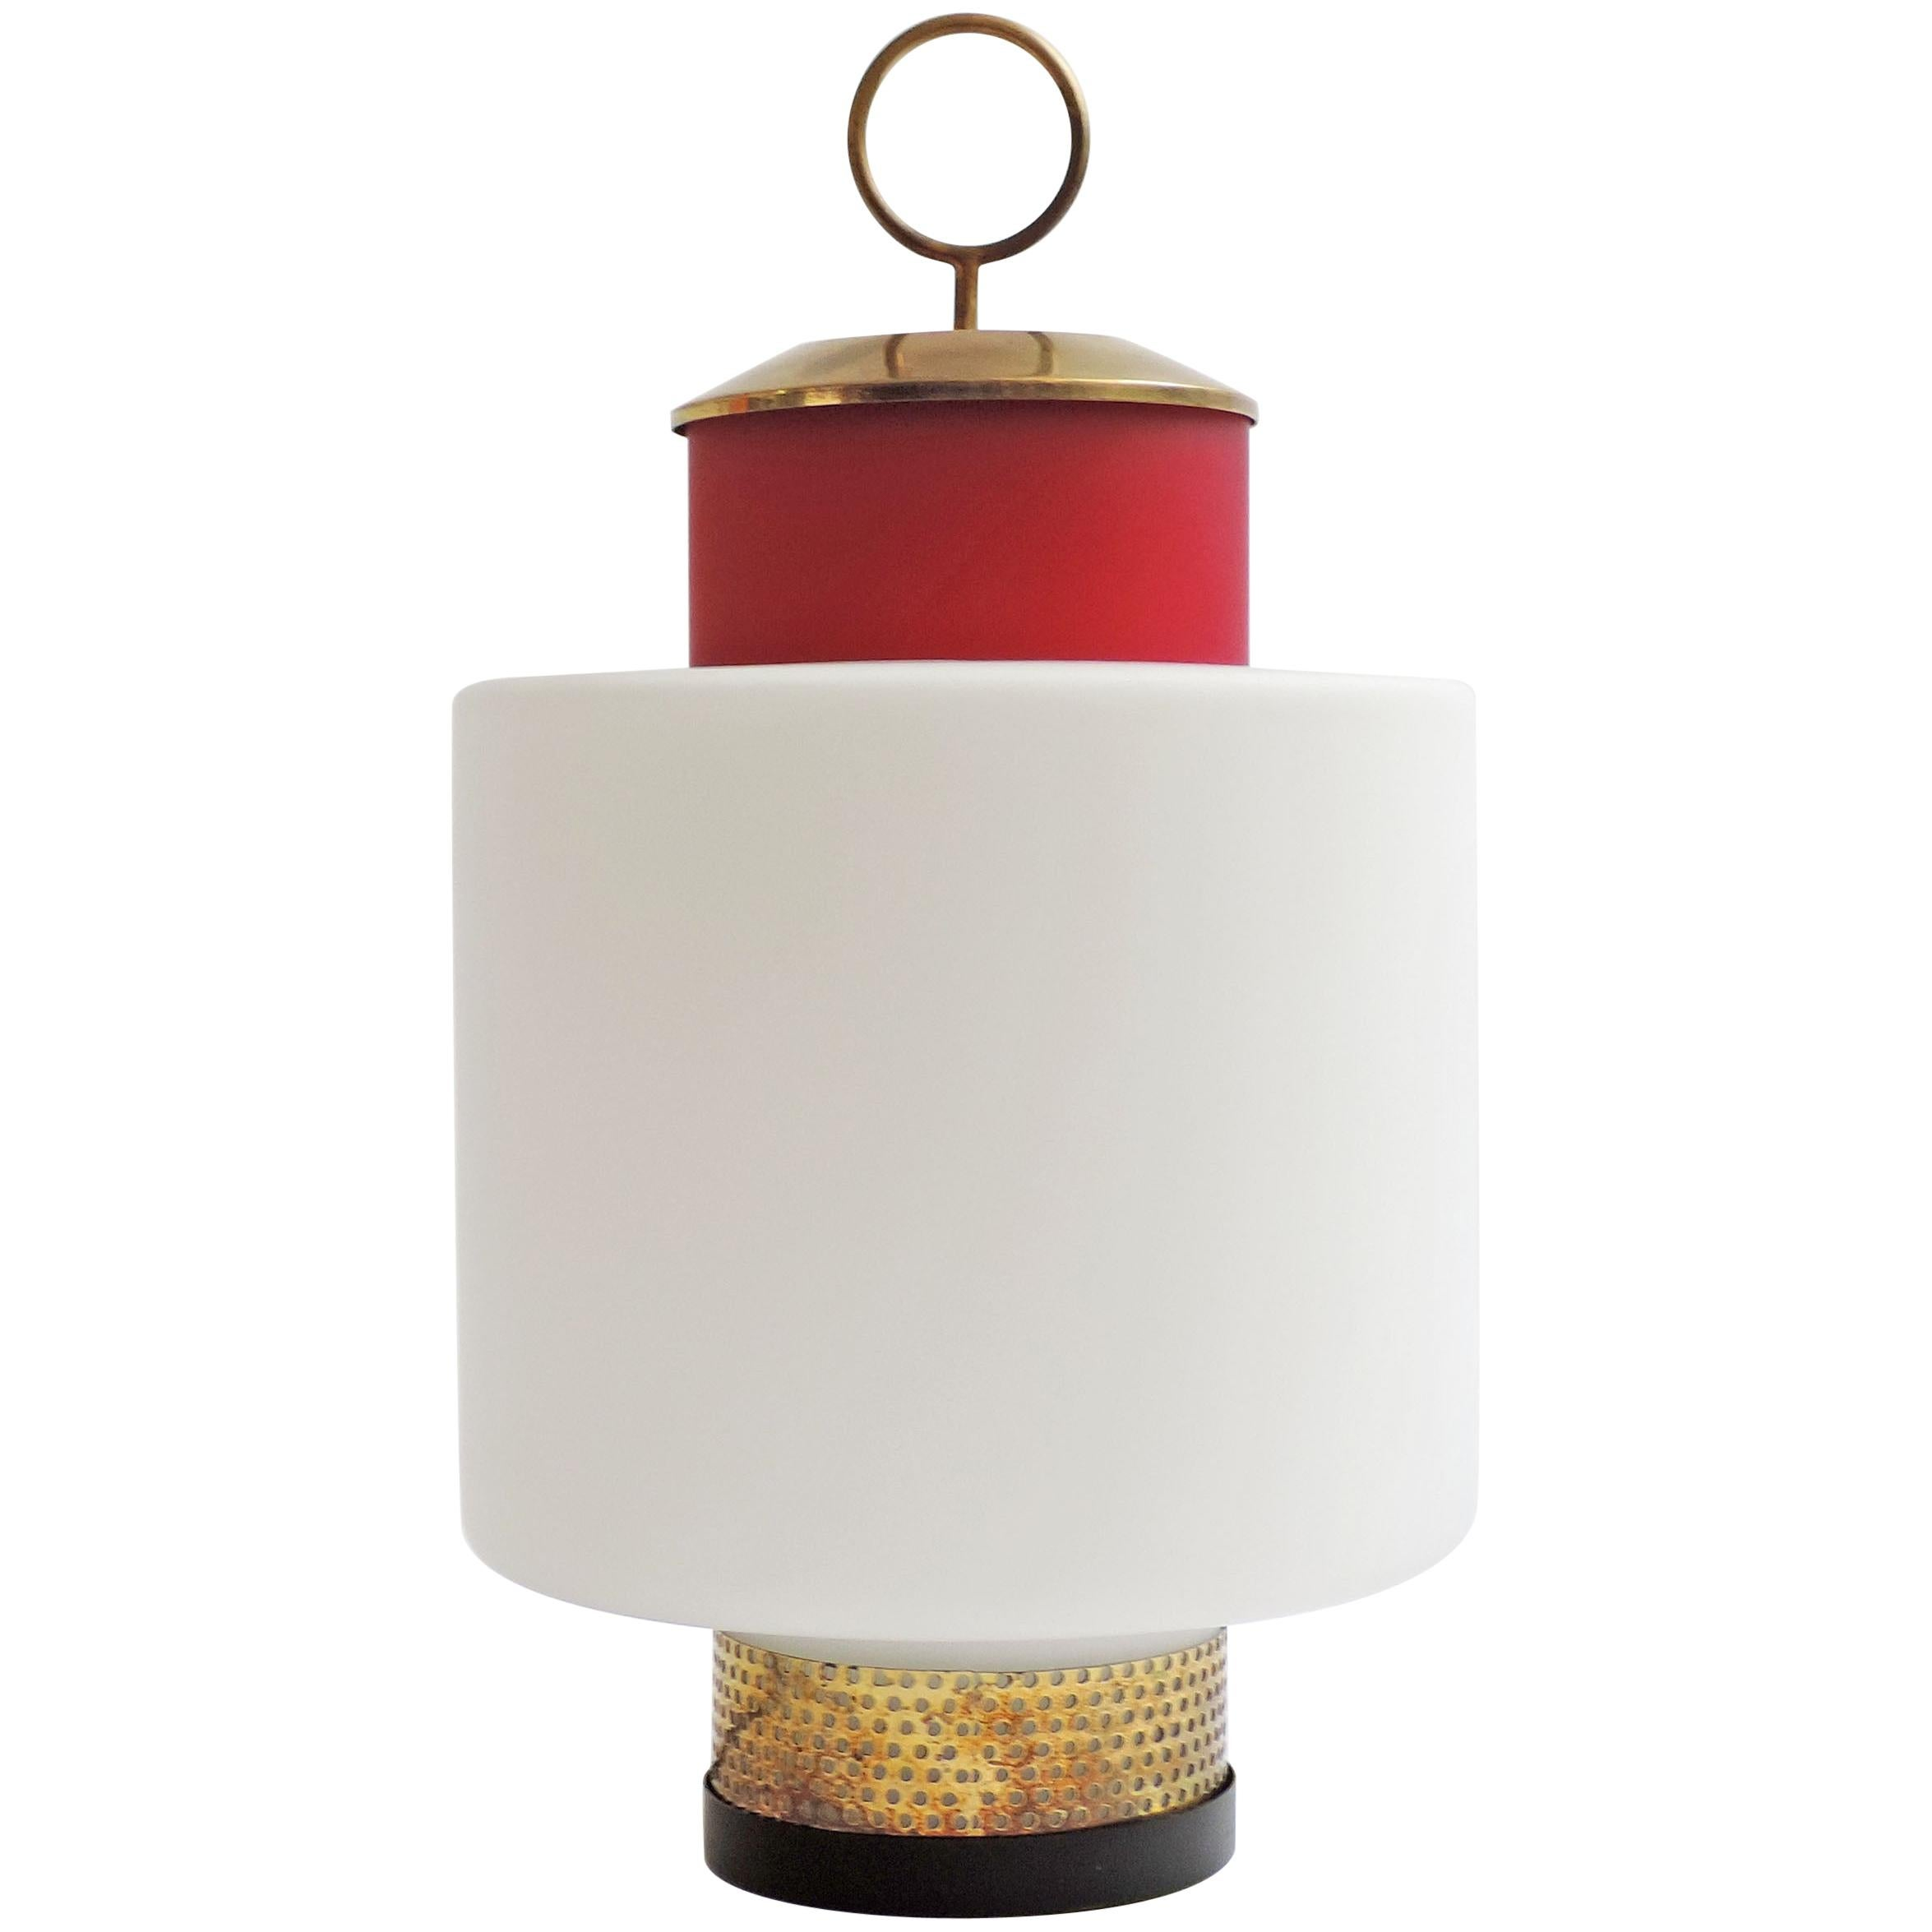 Stilnovo Mod. 8052 Table Lamp, Italy, 1950s